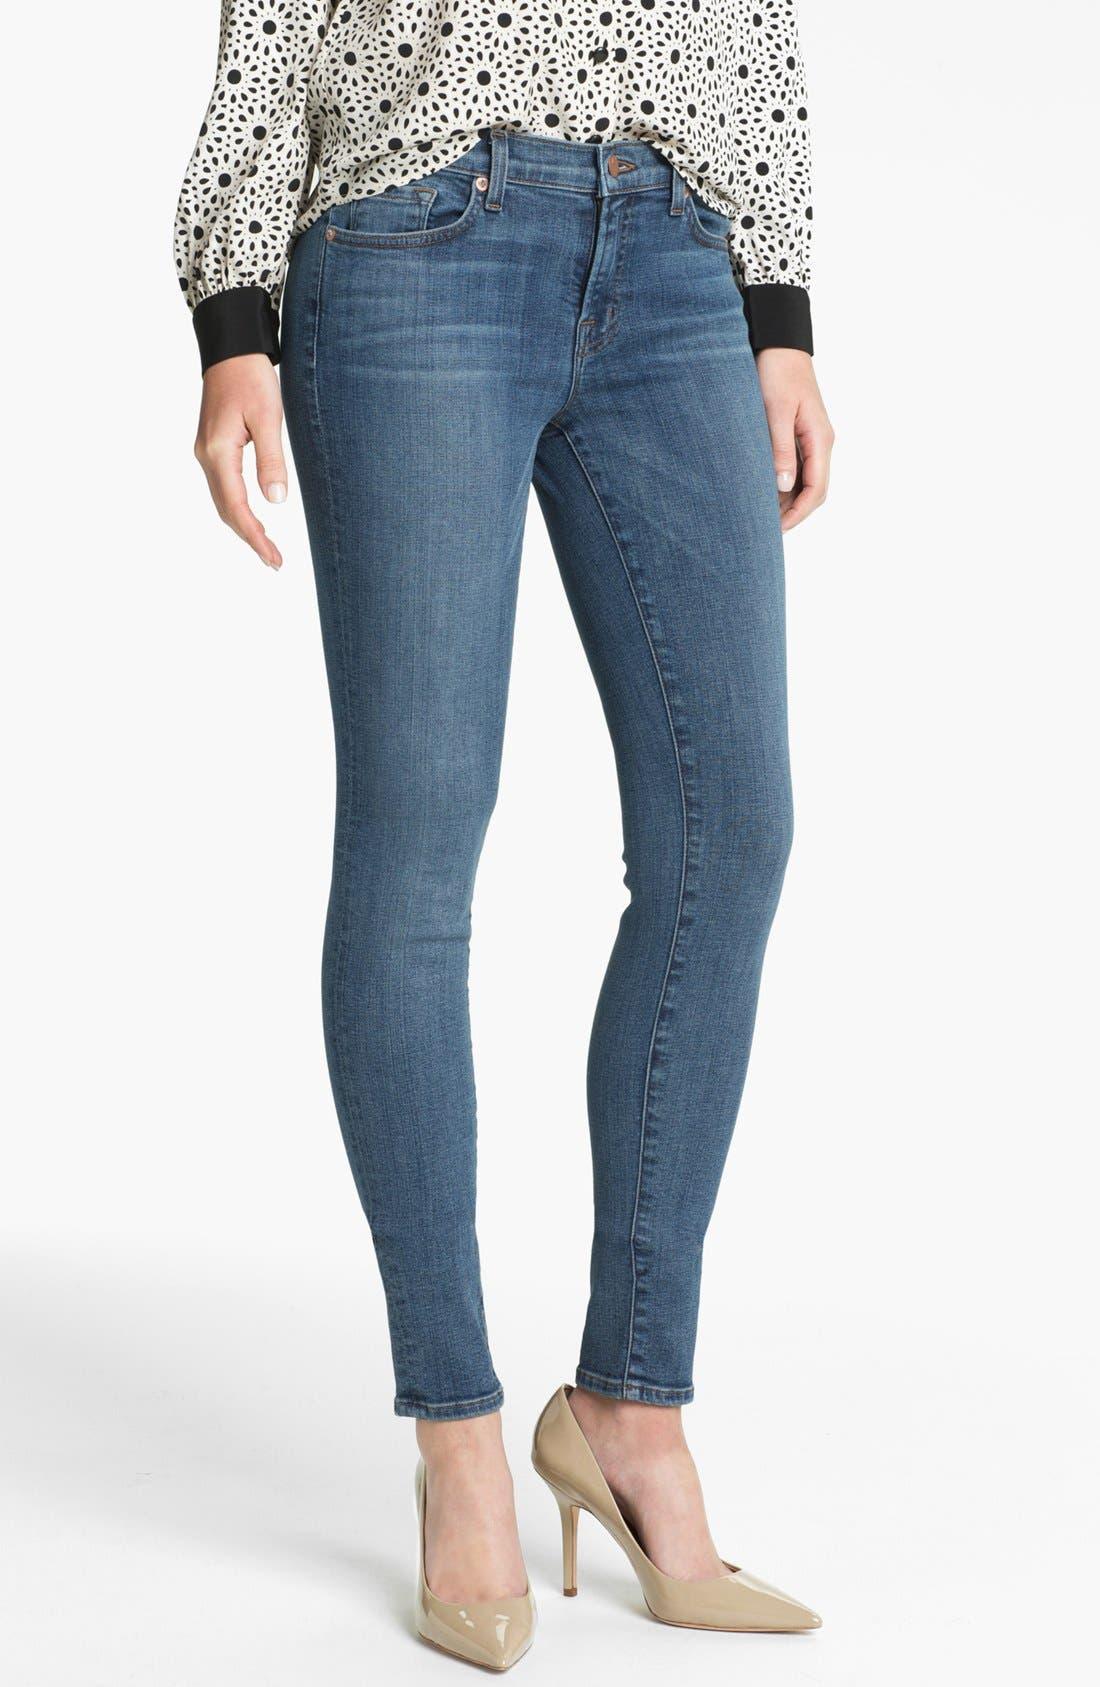 Alternate Image 1 Selected - J Brand '620' Mid-Rise Skinny Jeans (Bayside)